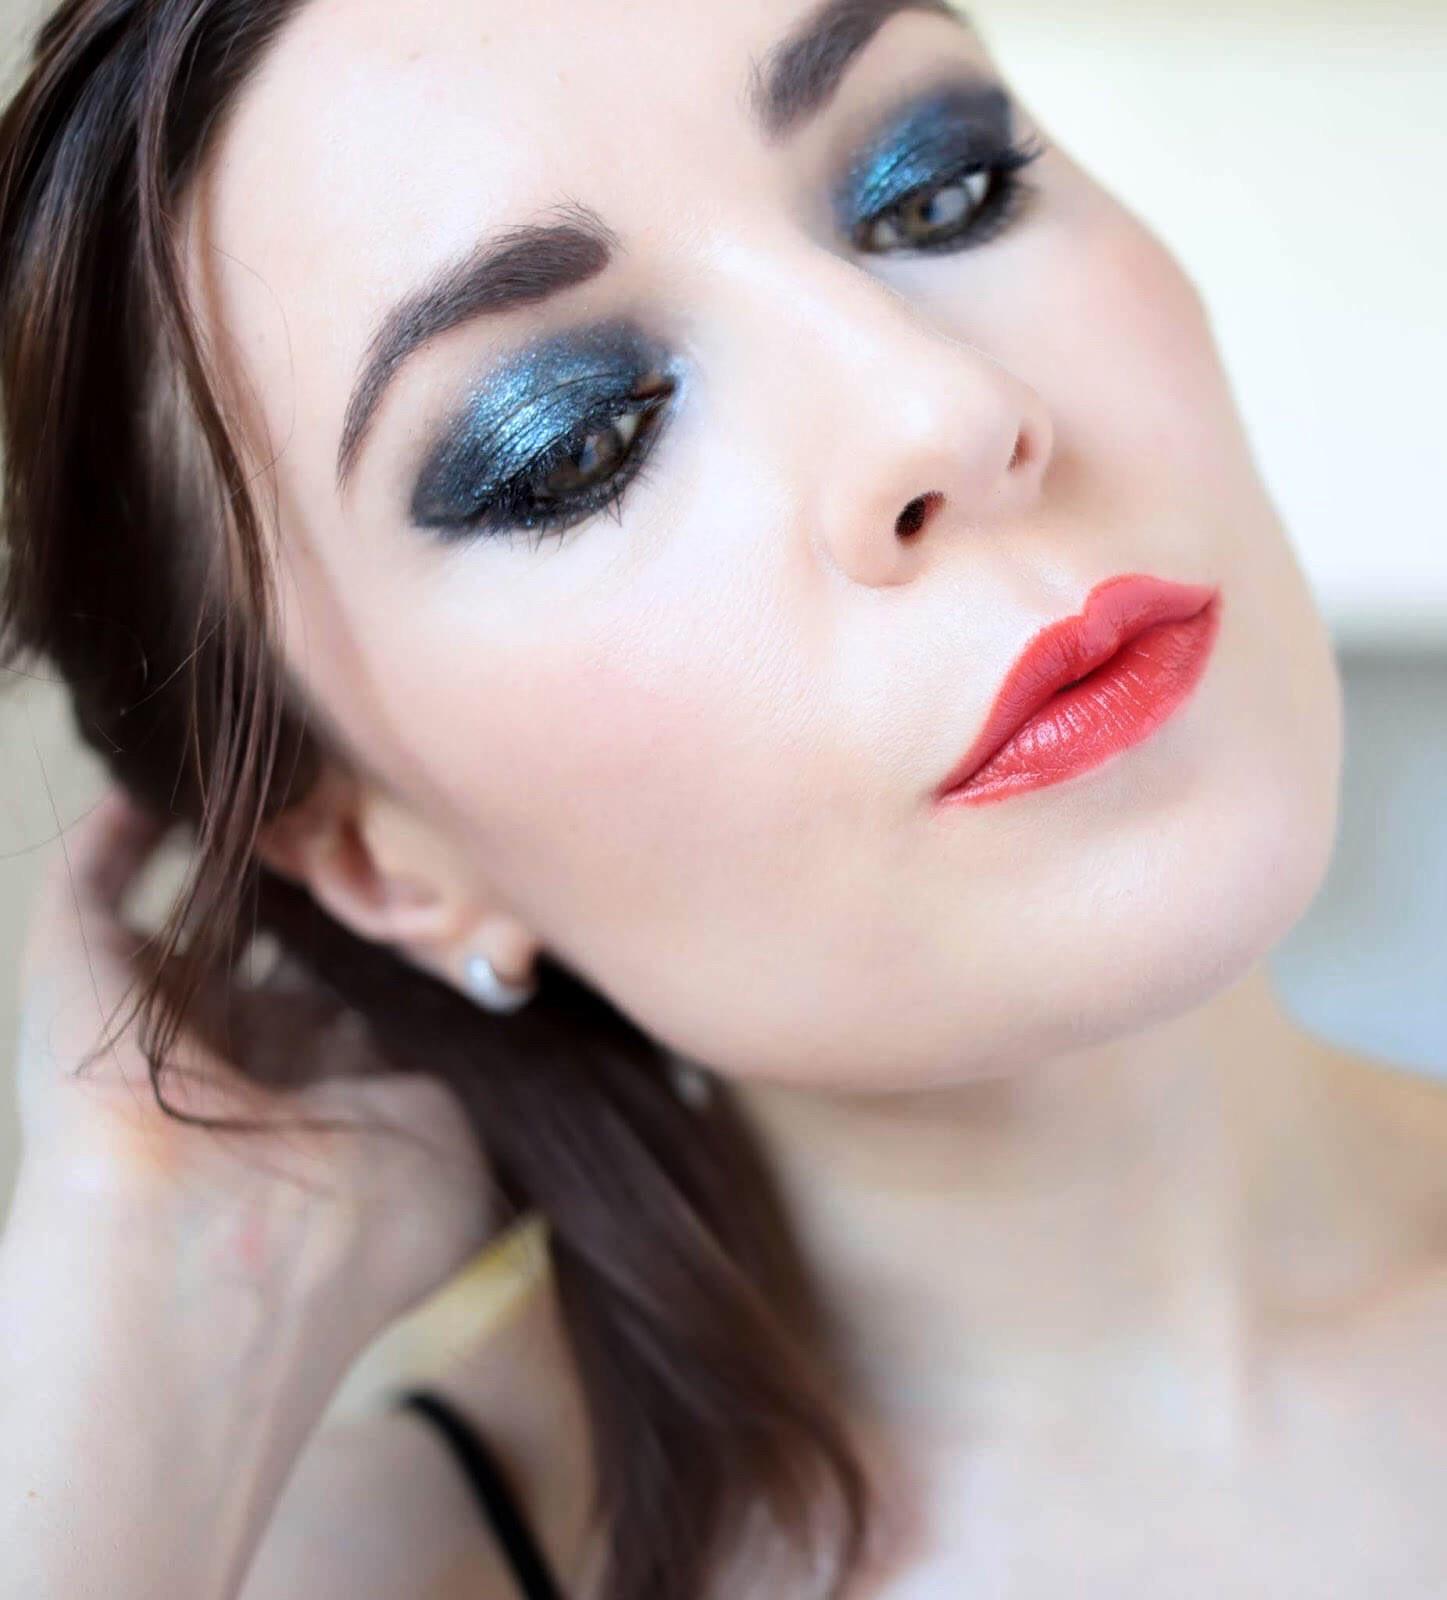 Lancôme Mert Marcus Maquillage